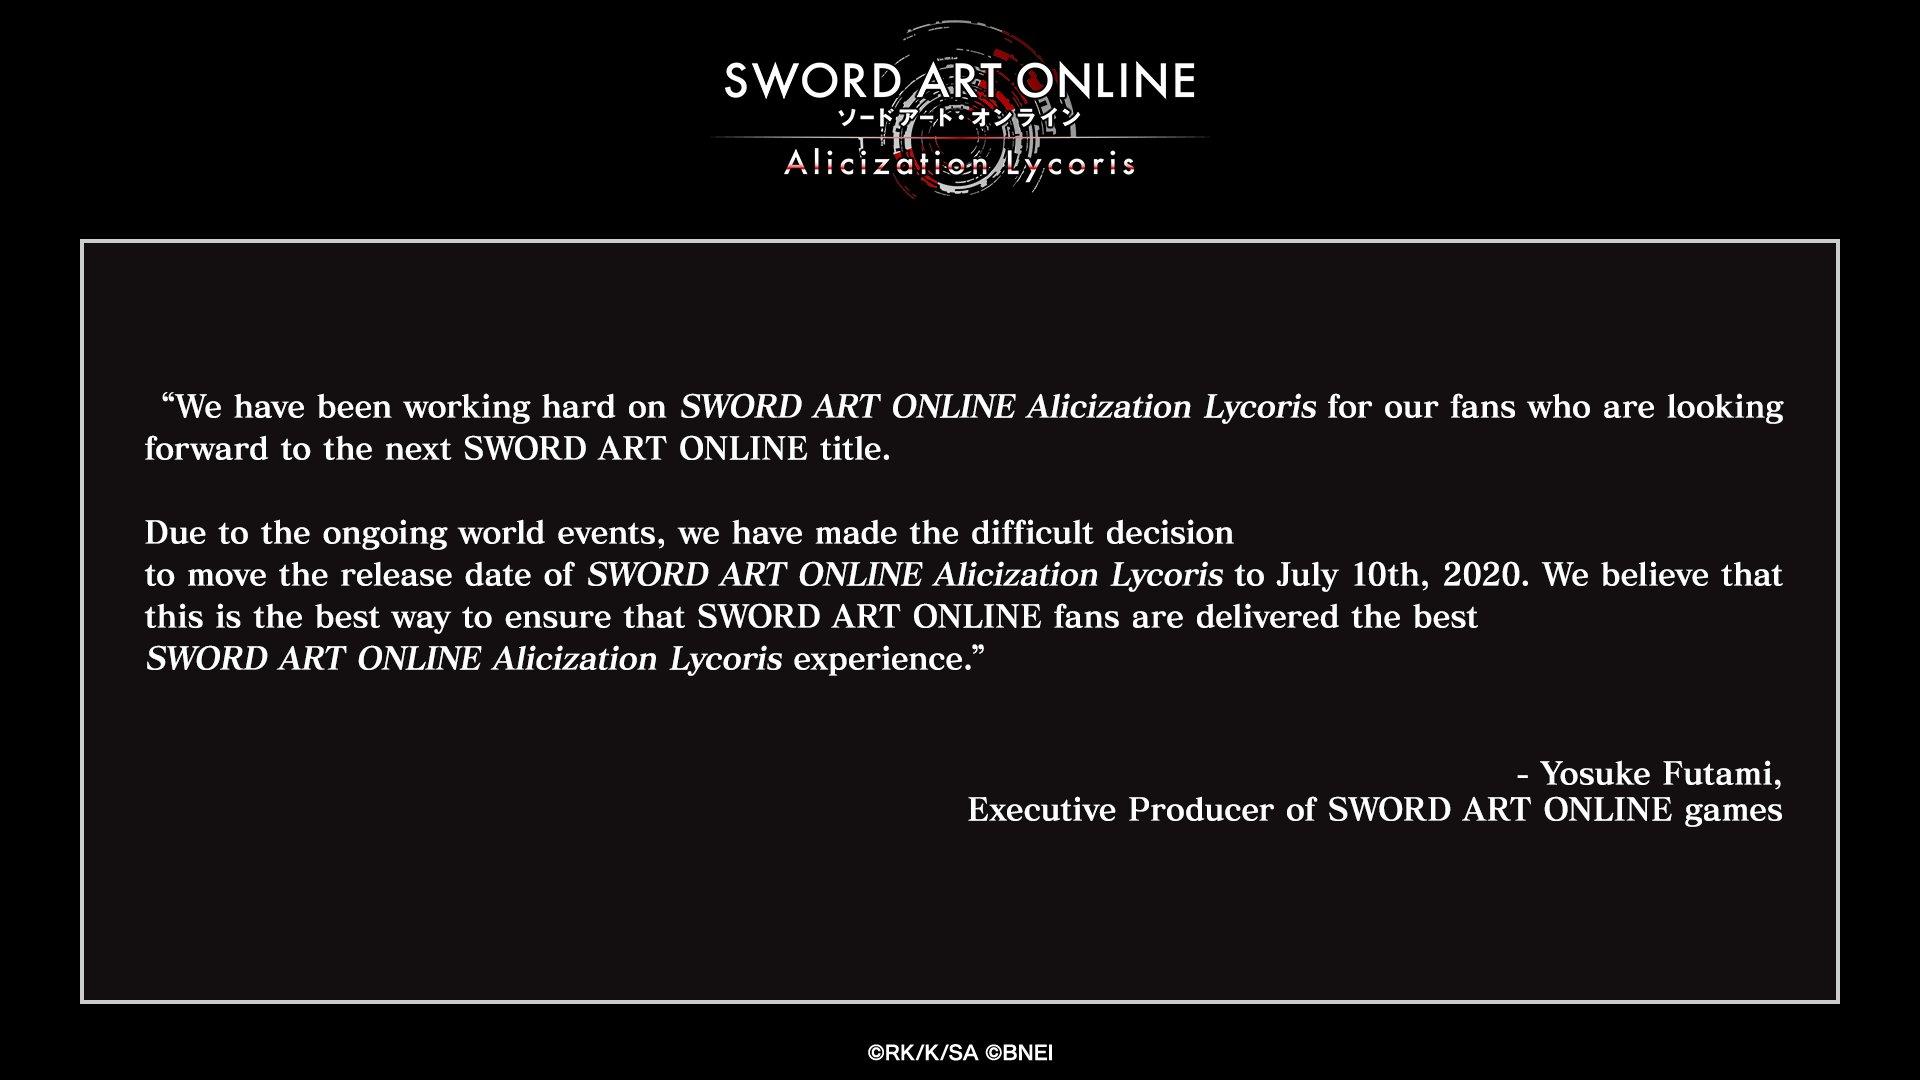 Sword Art Online: Alicization Lycoris Release Delayed